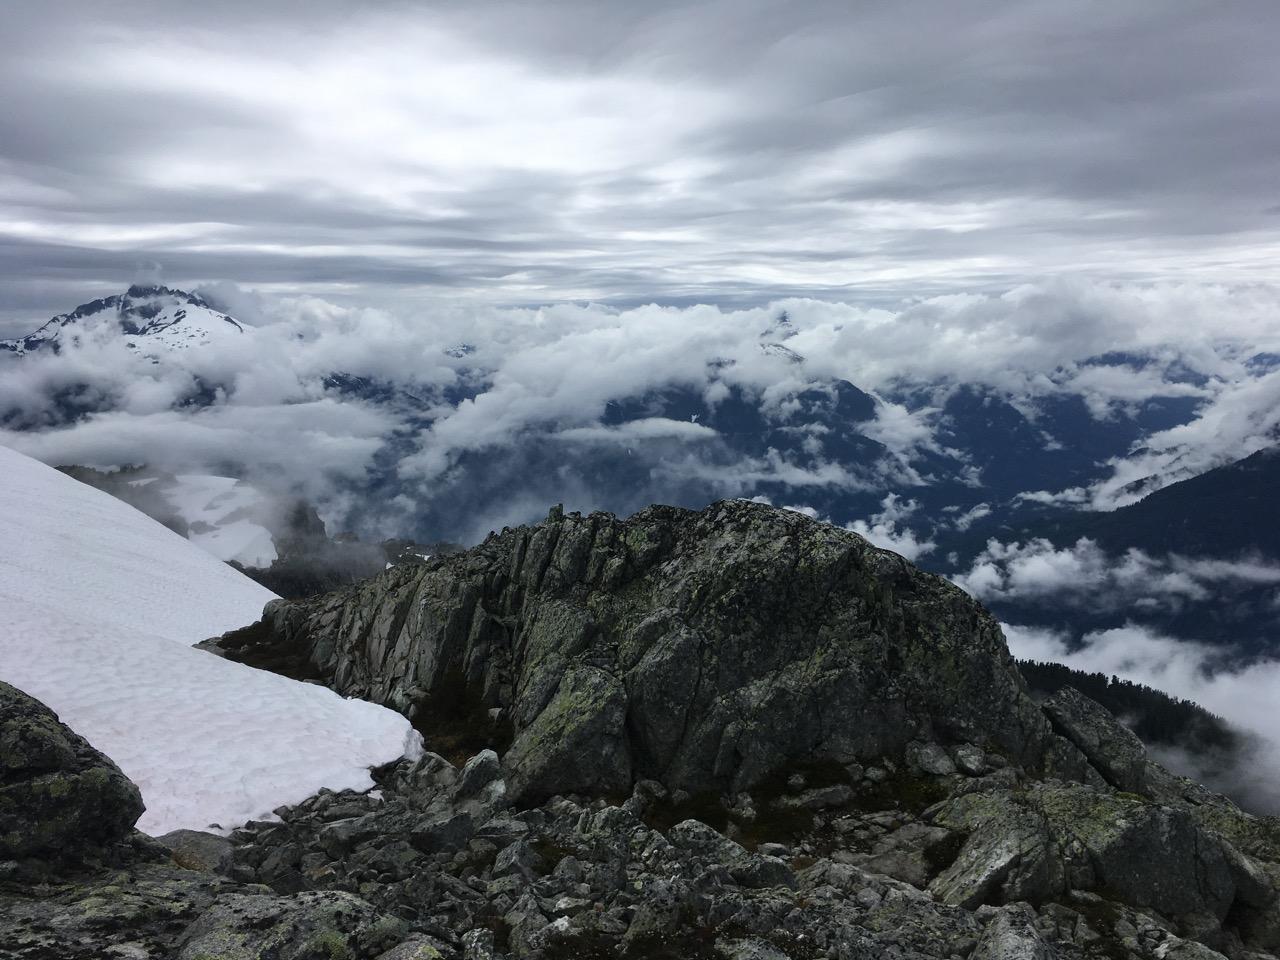 Cloudburst Mountain